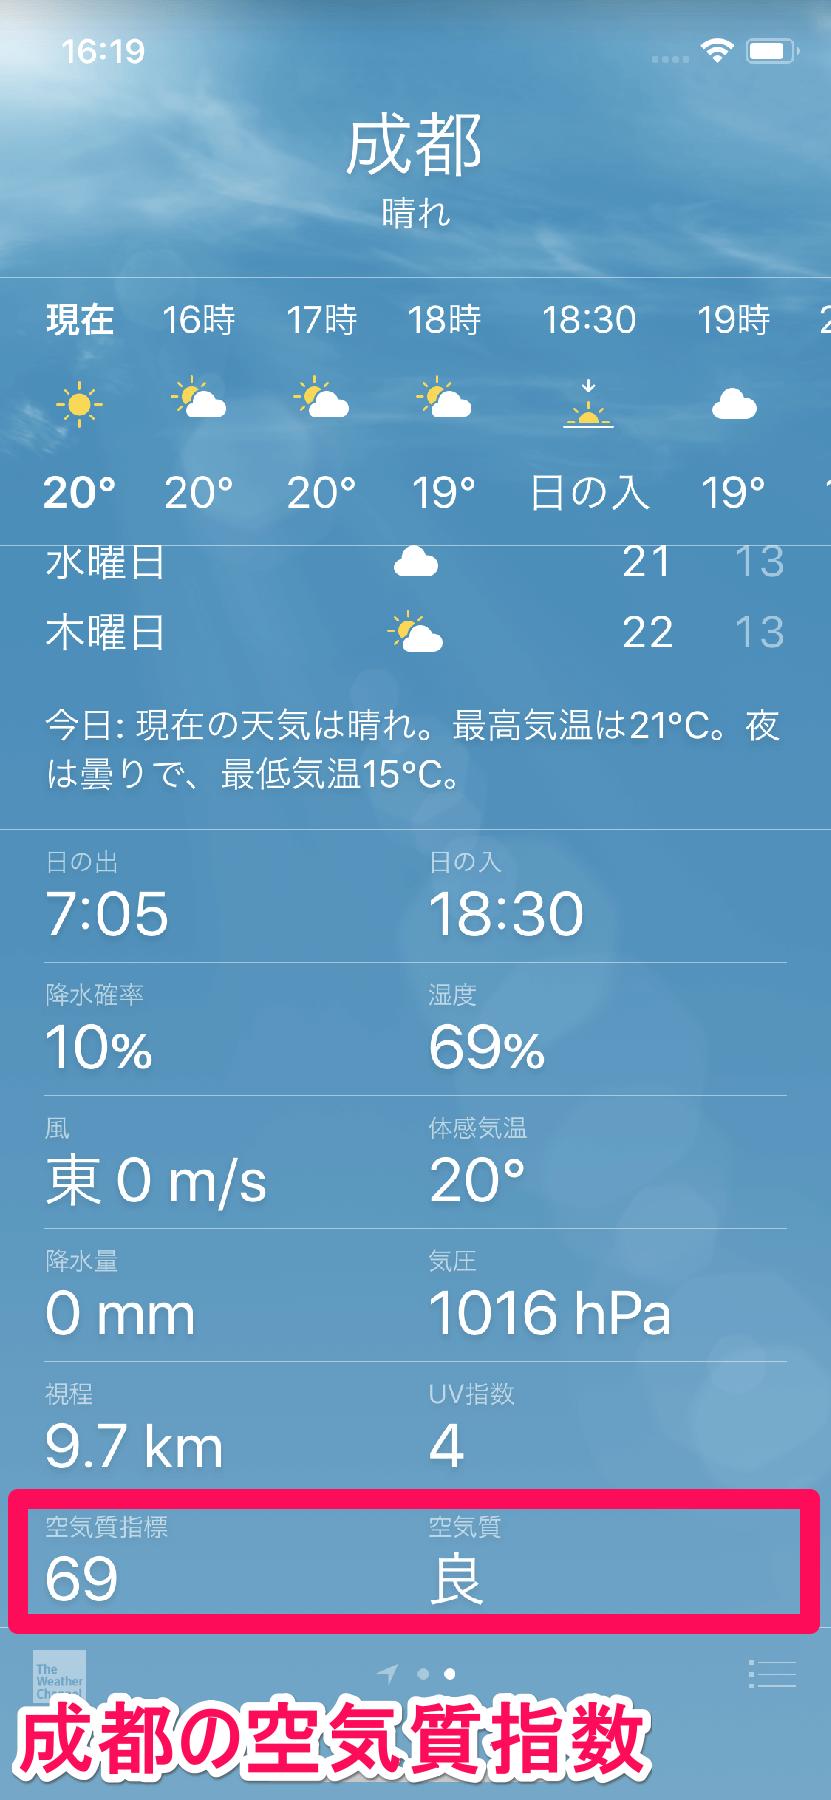 iPhone(アイフォーン、アイフォン)の天気アプリで成都(中国)の空気質指数と空気質を表示した画面